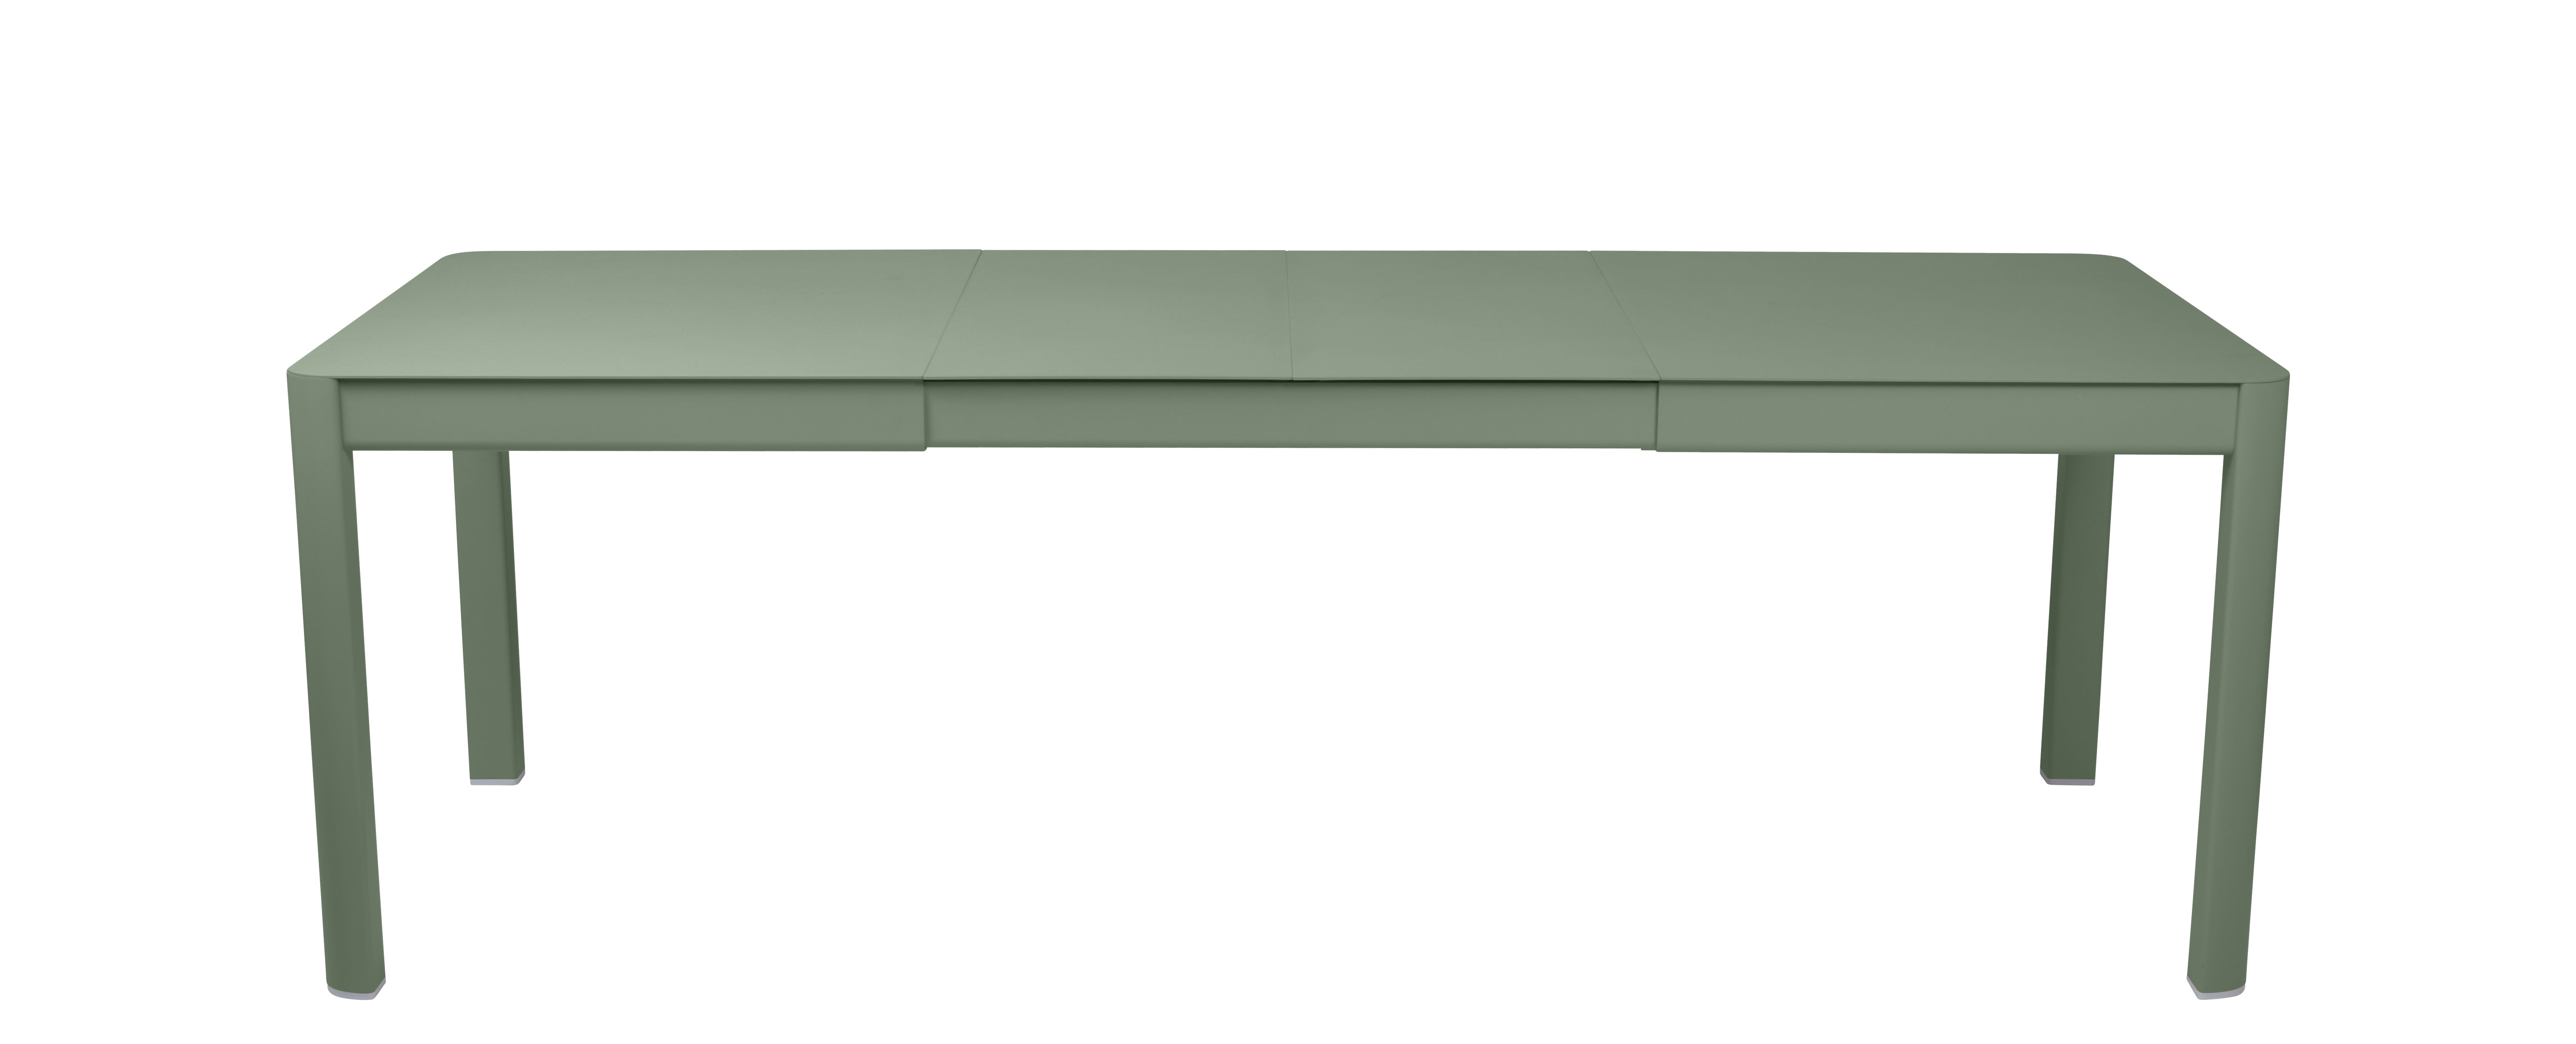 Outdoor - Tables de jardin - Table à rallonge Ribambelle Medium / L 149 à 234 cm - 6 à 10 personnes - Fermob - Cactus - Aluminium